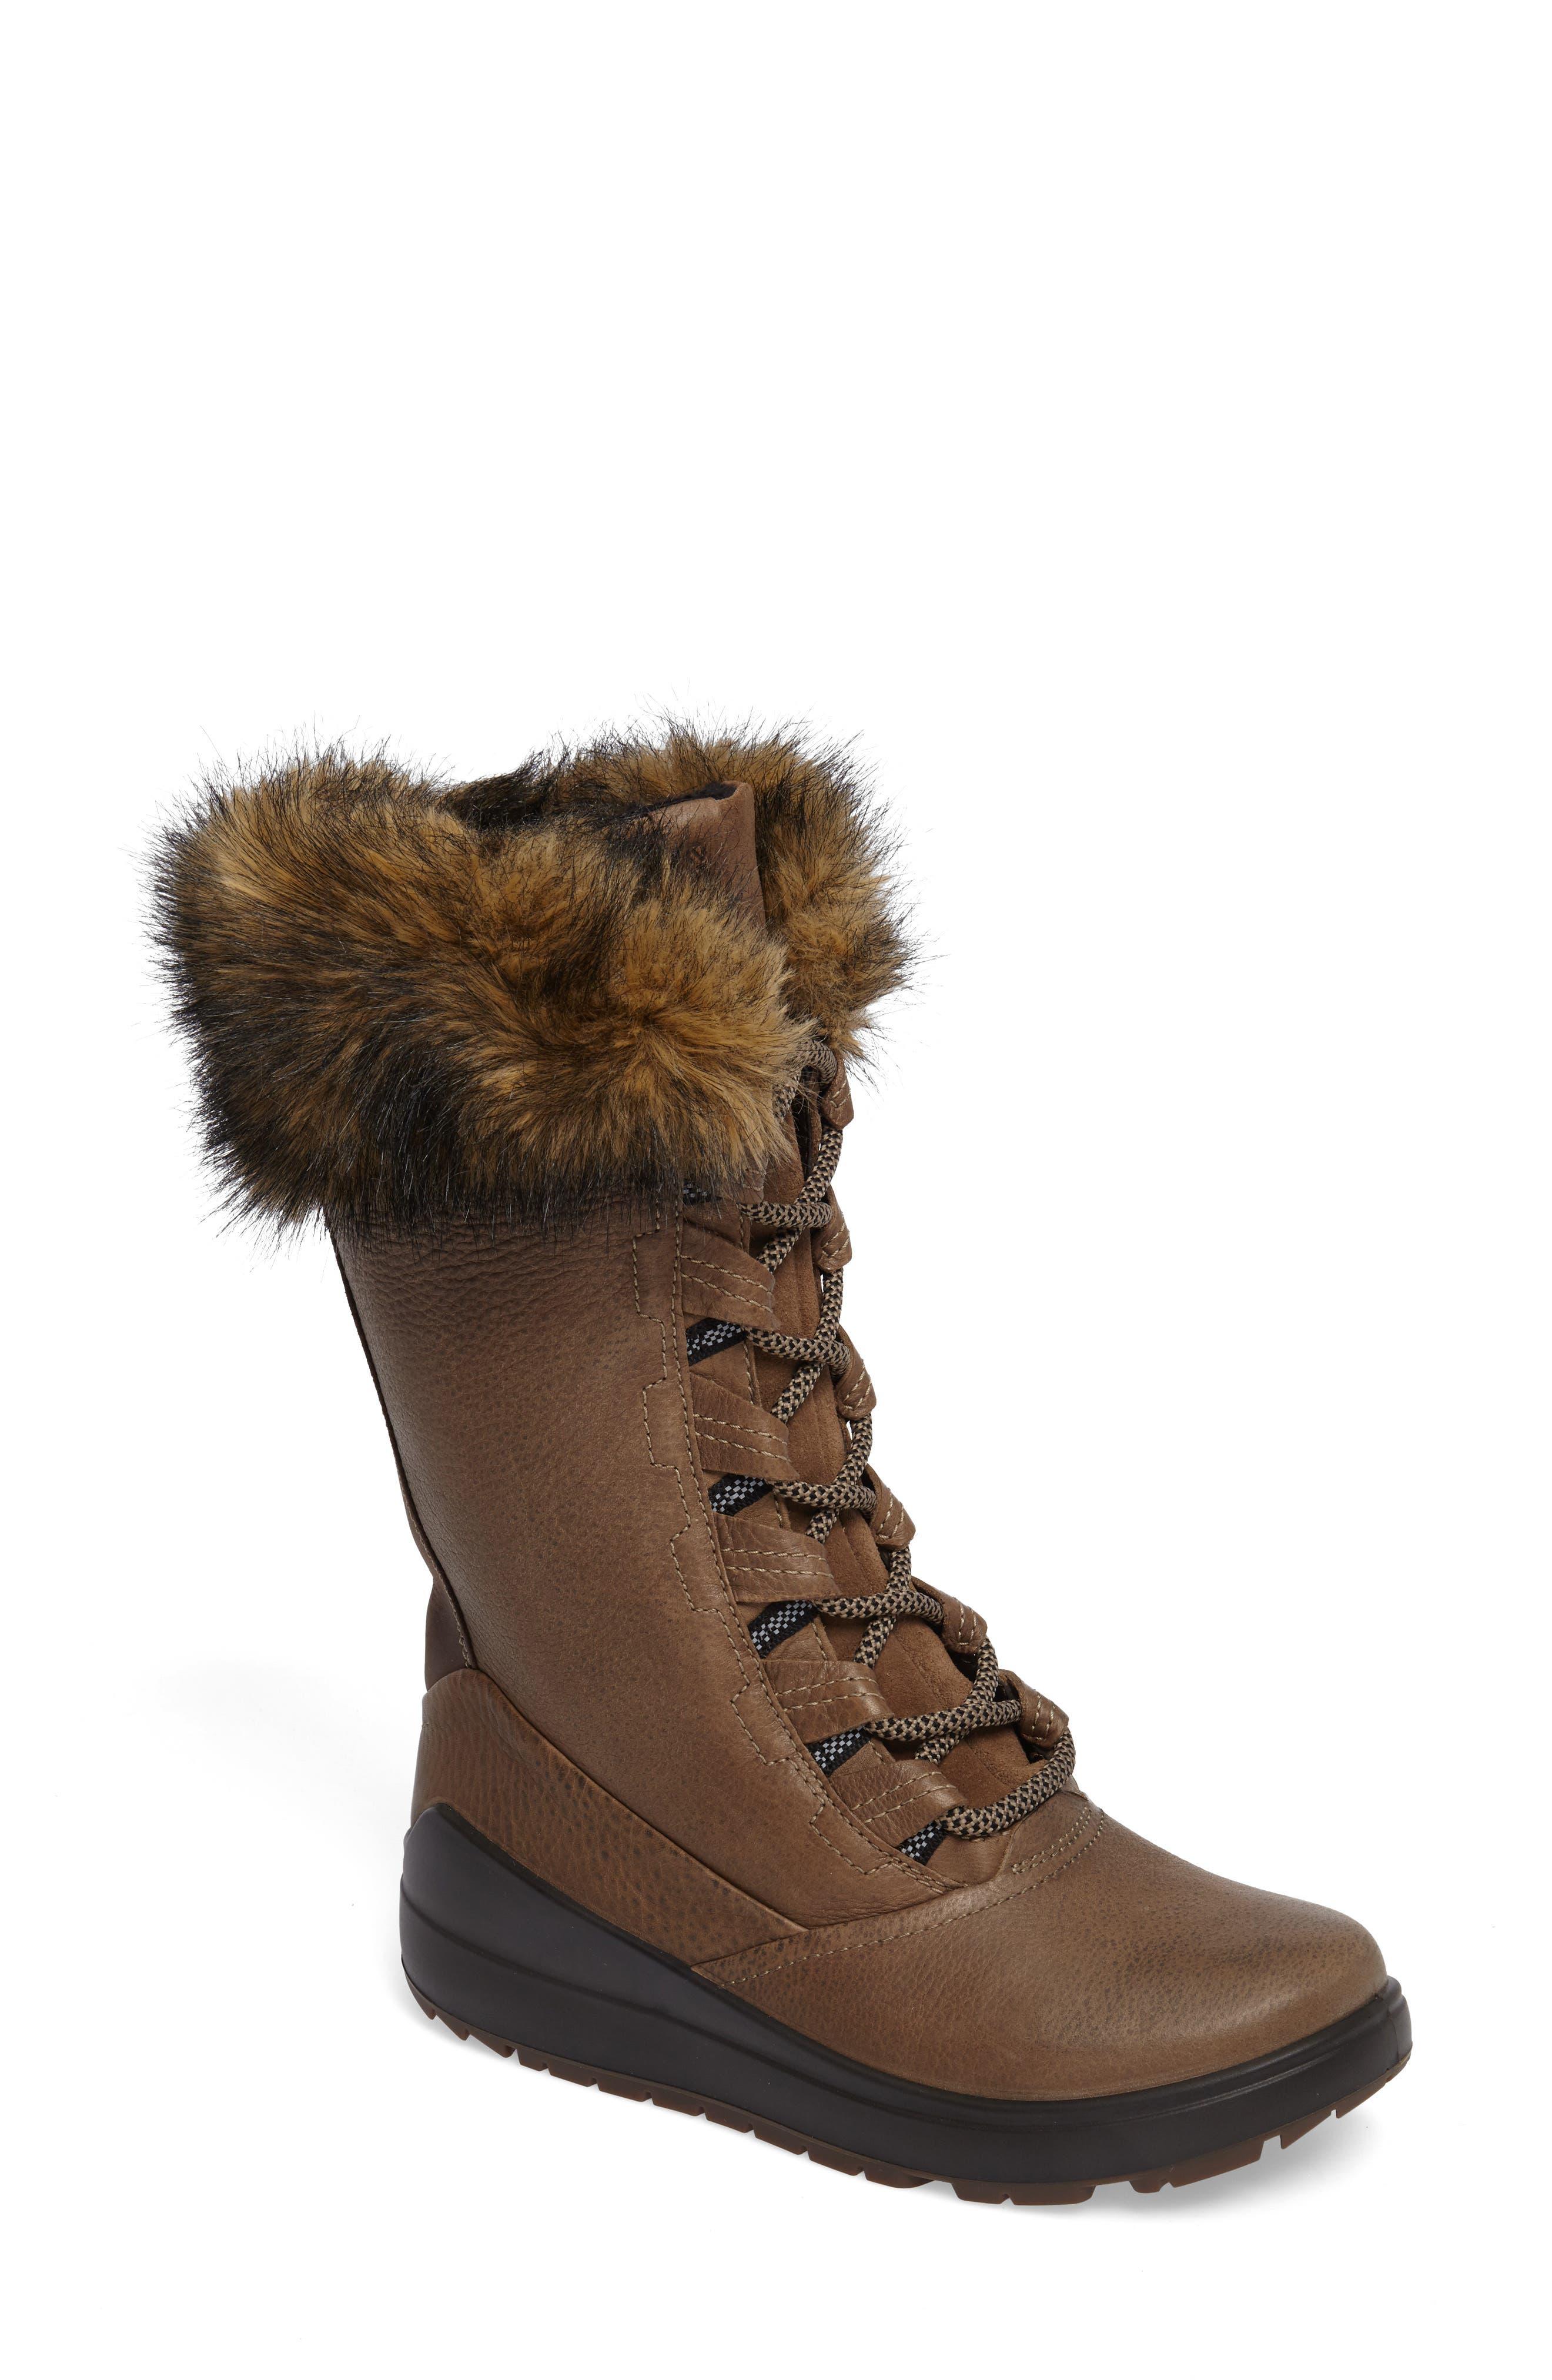 ECCO Noyce Siberia Hydromax Water Resistant Winter Boot with Faux Fur Trim (Women)